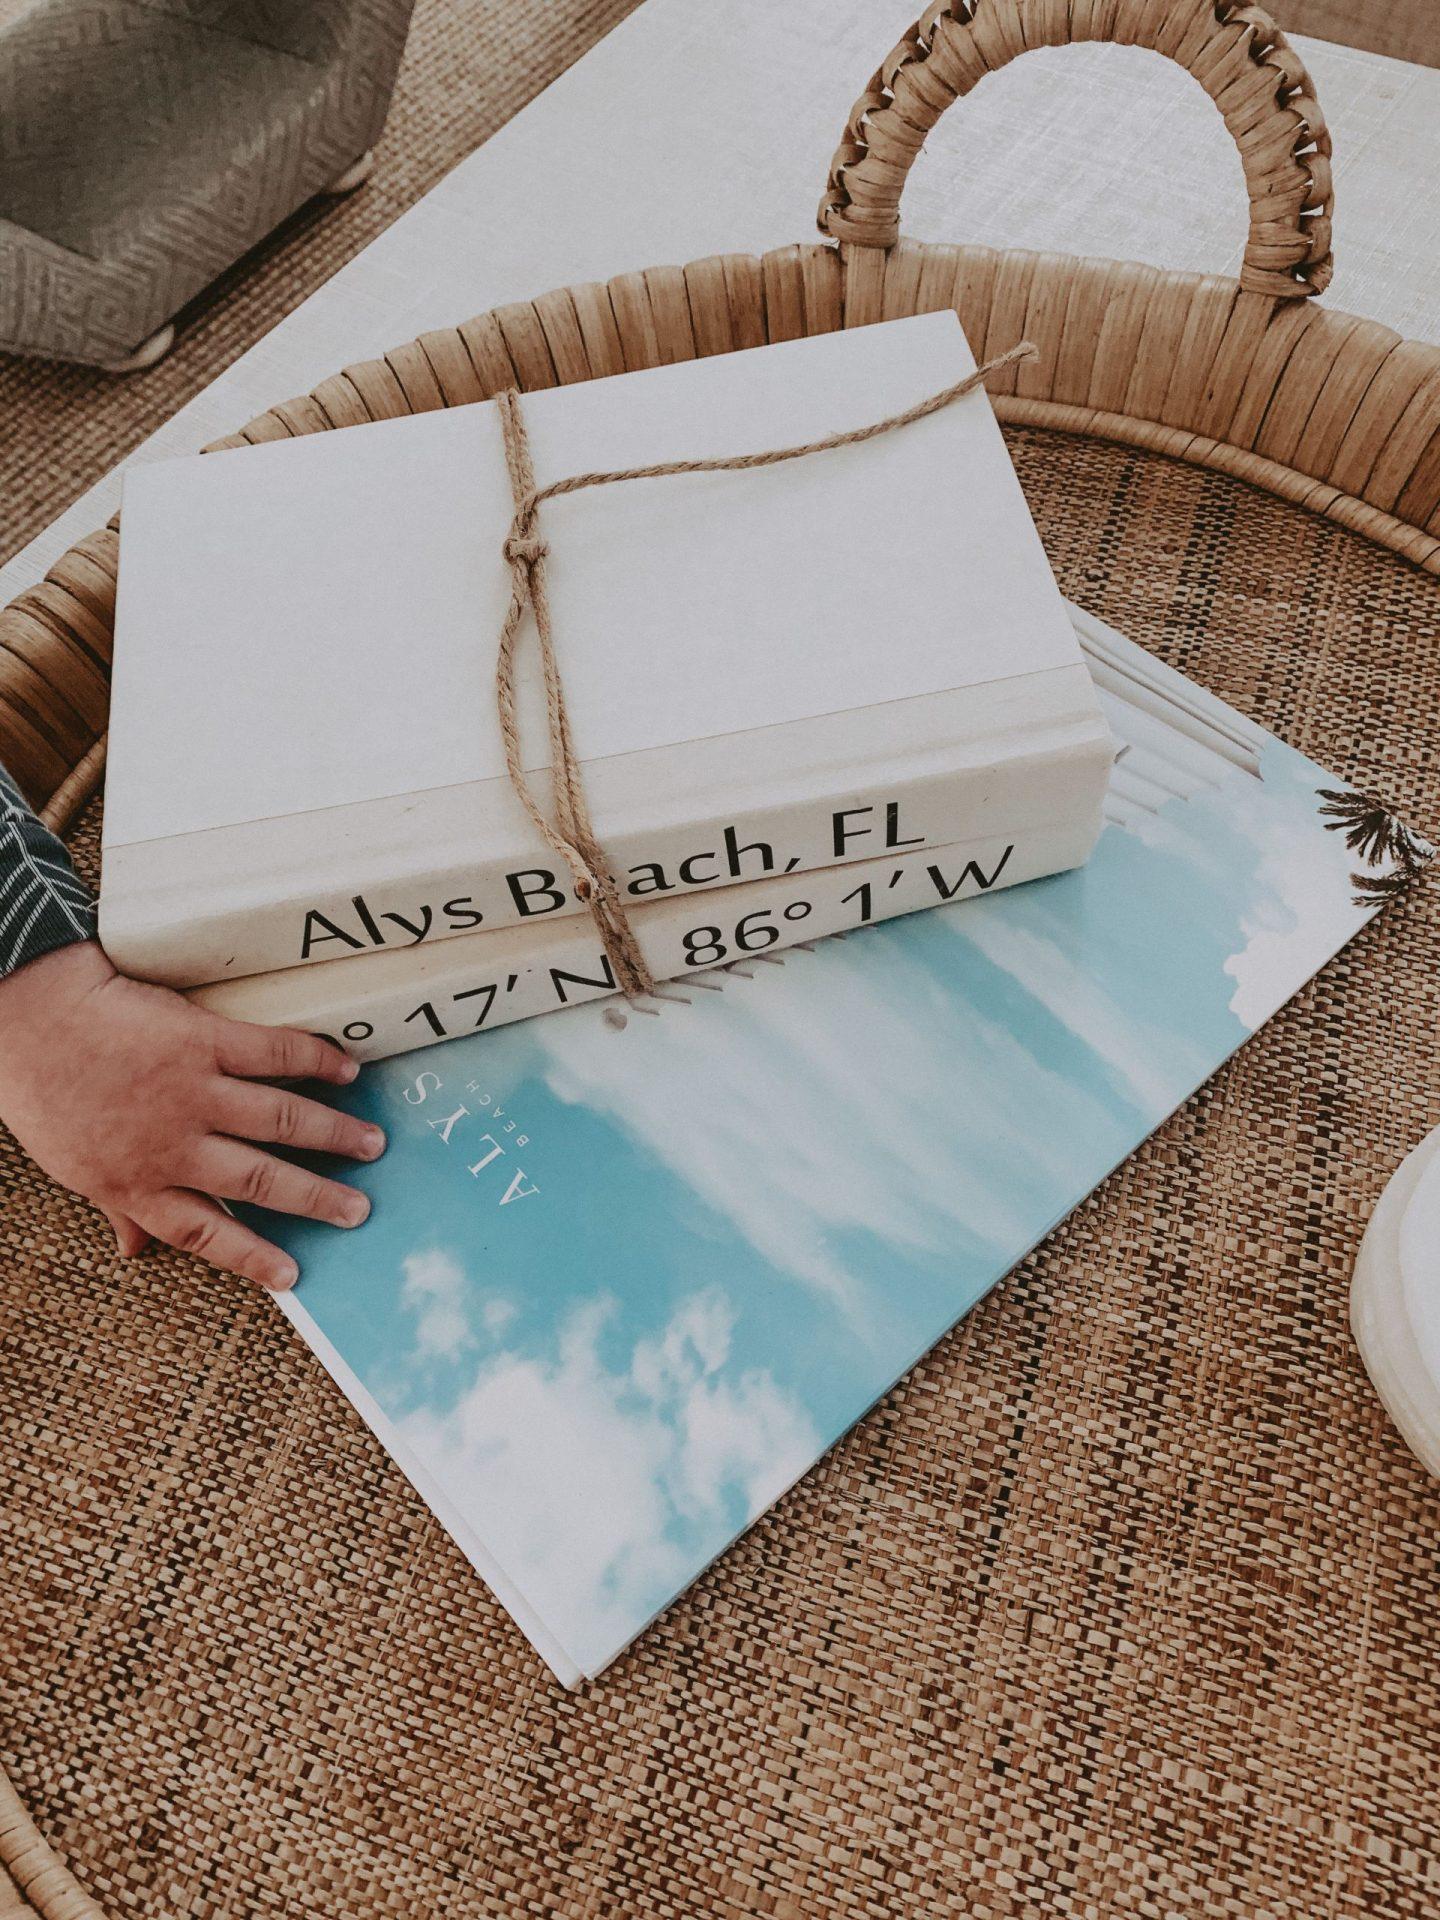 alys beach travel guide